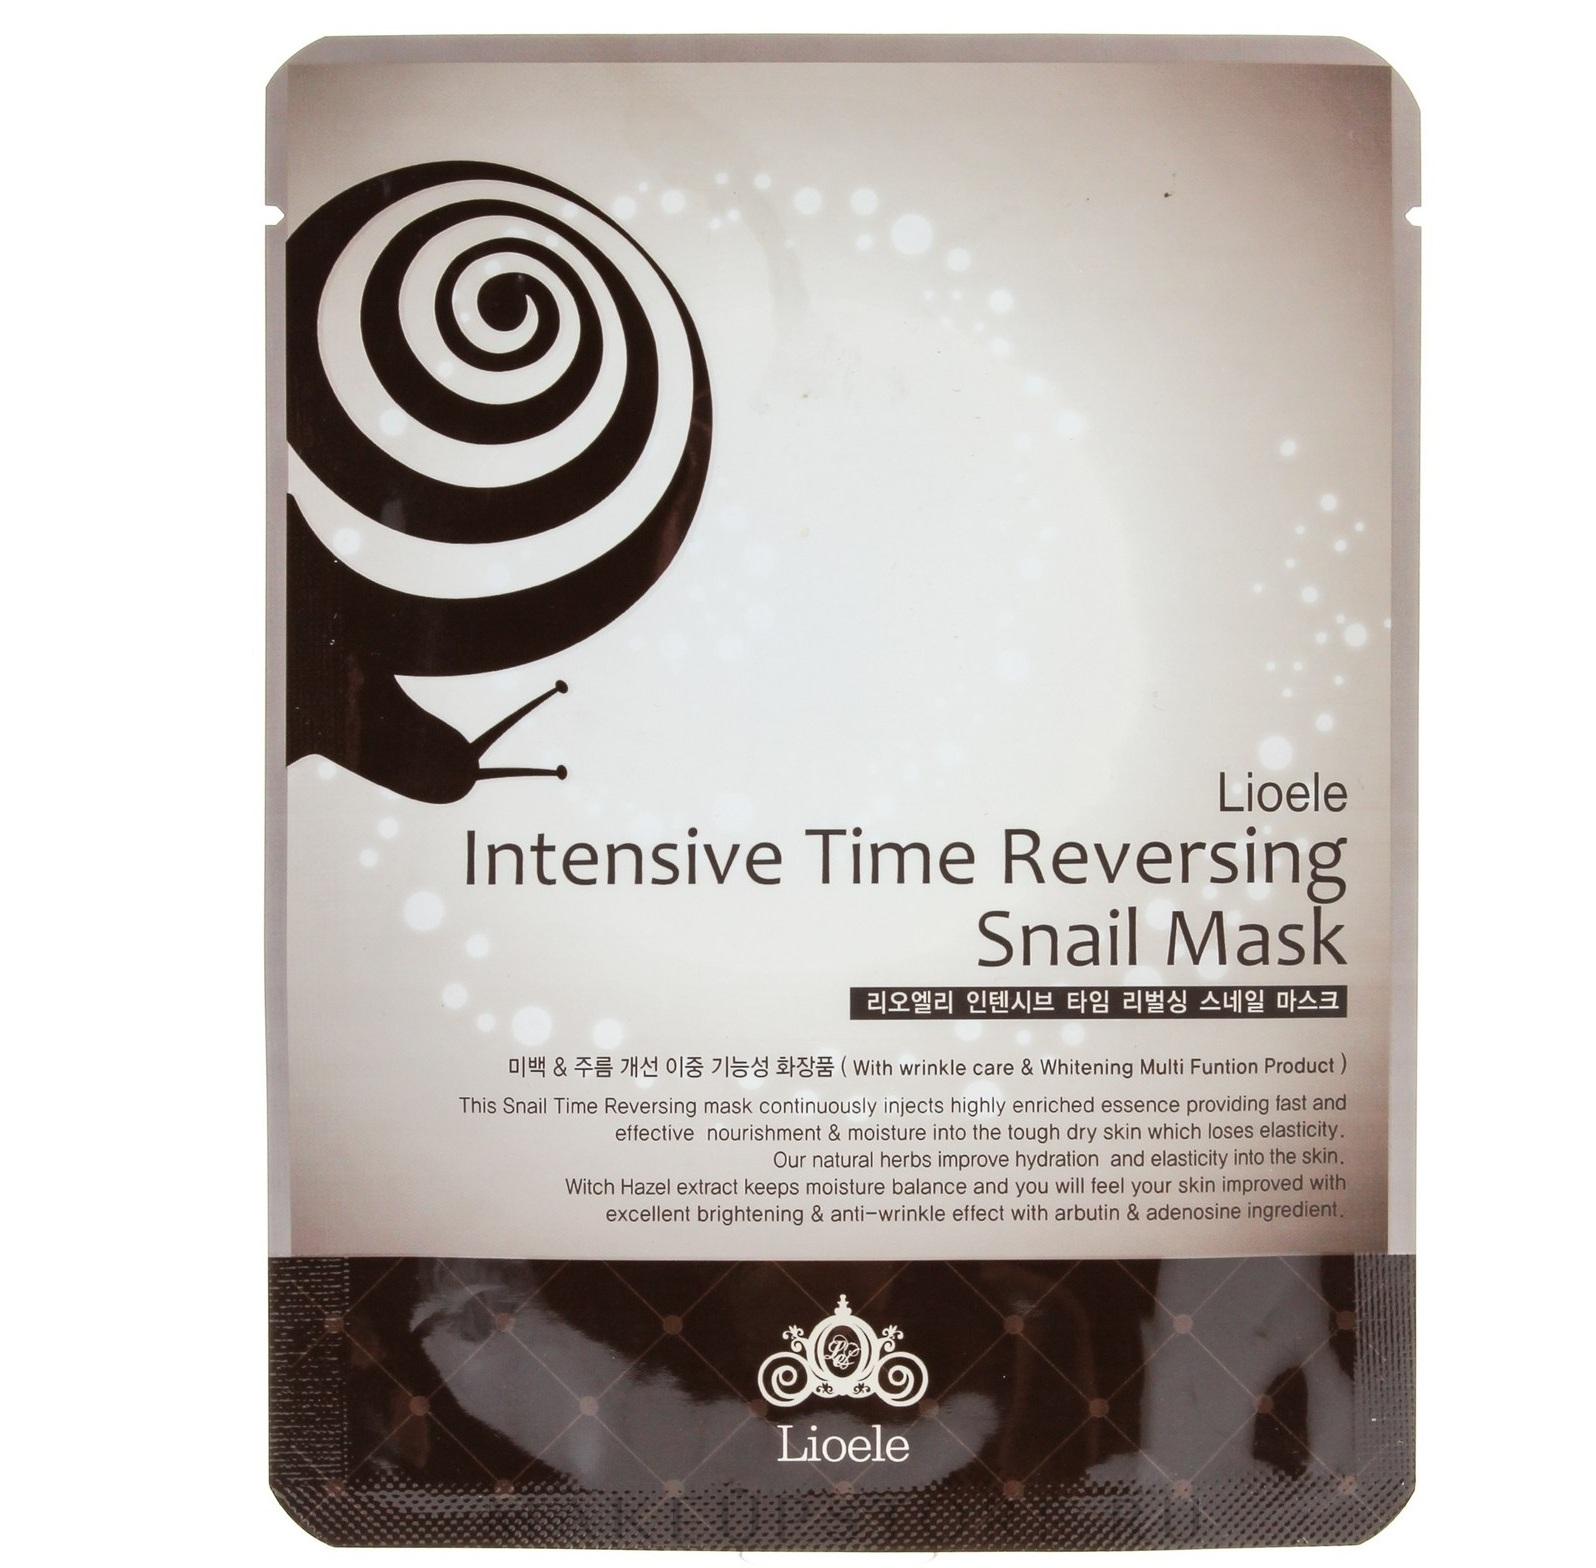 Lioele Intensive Time Reversing Snail Mask